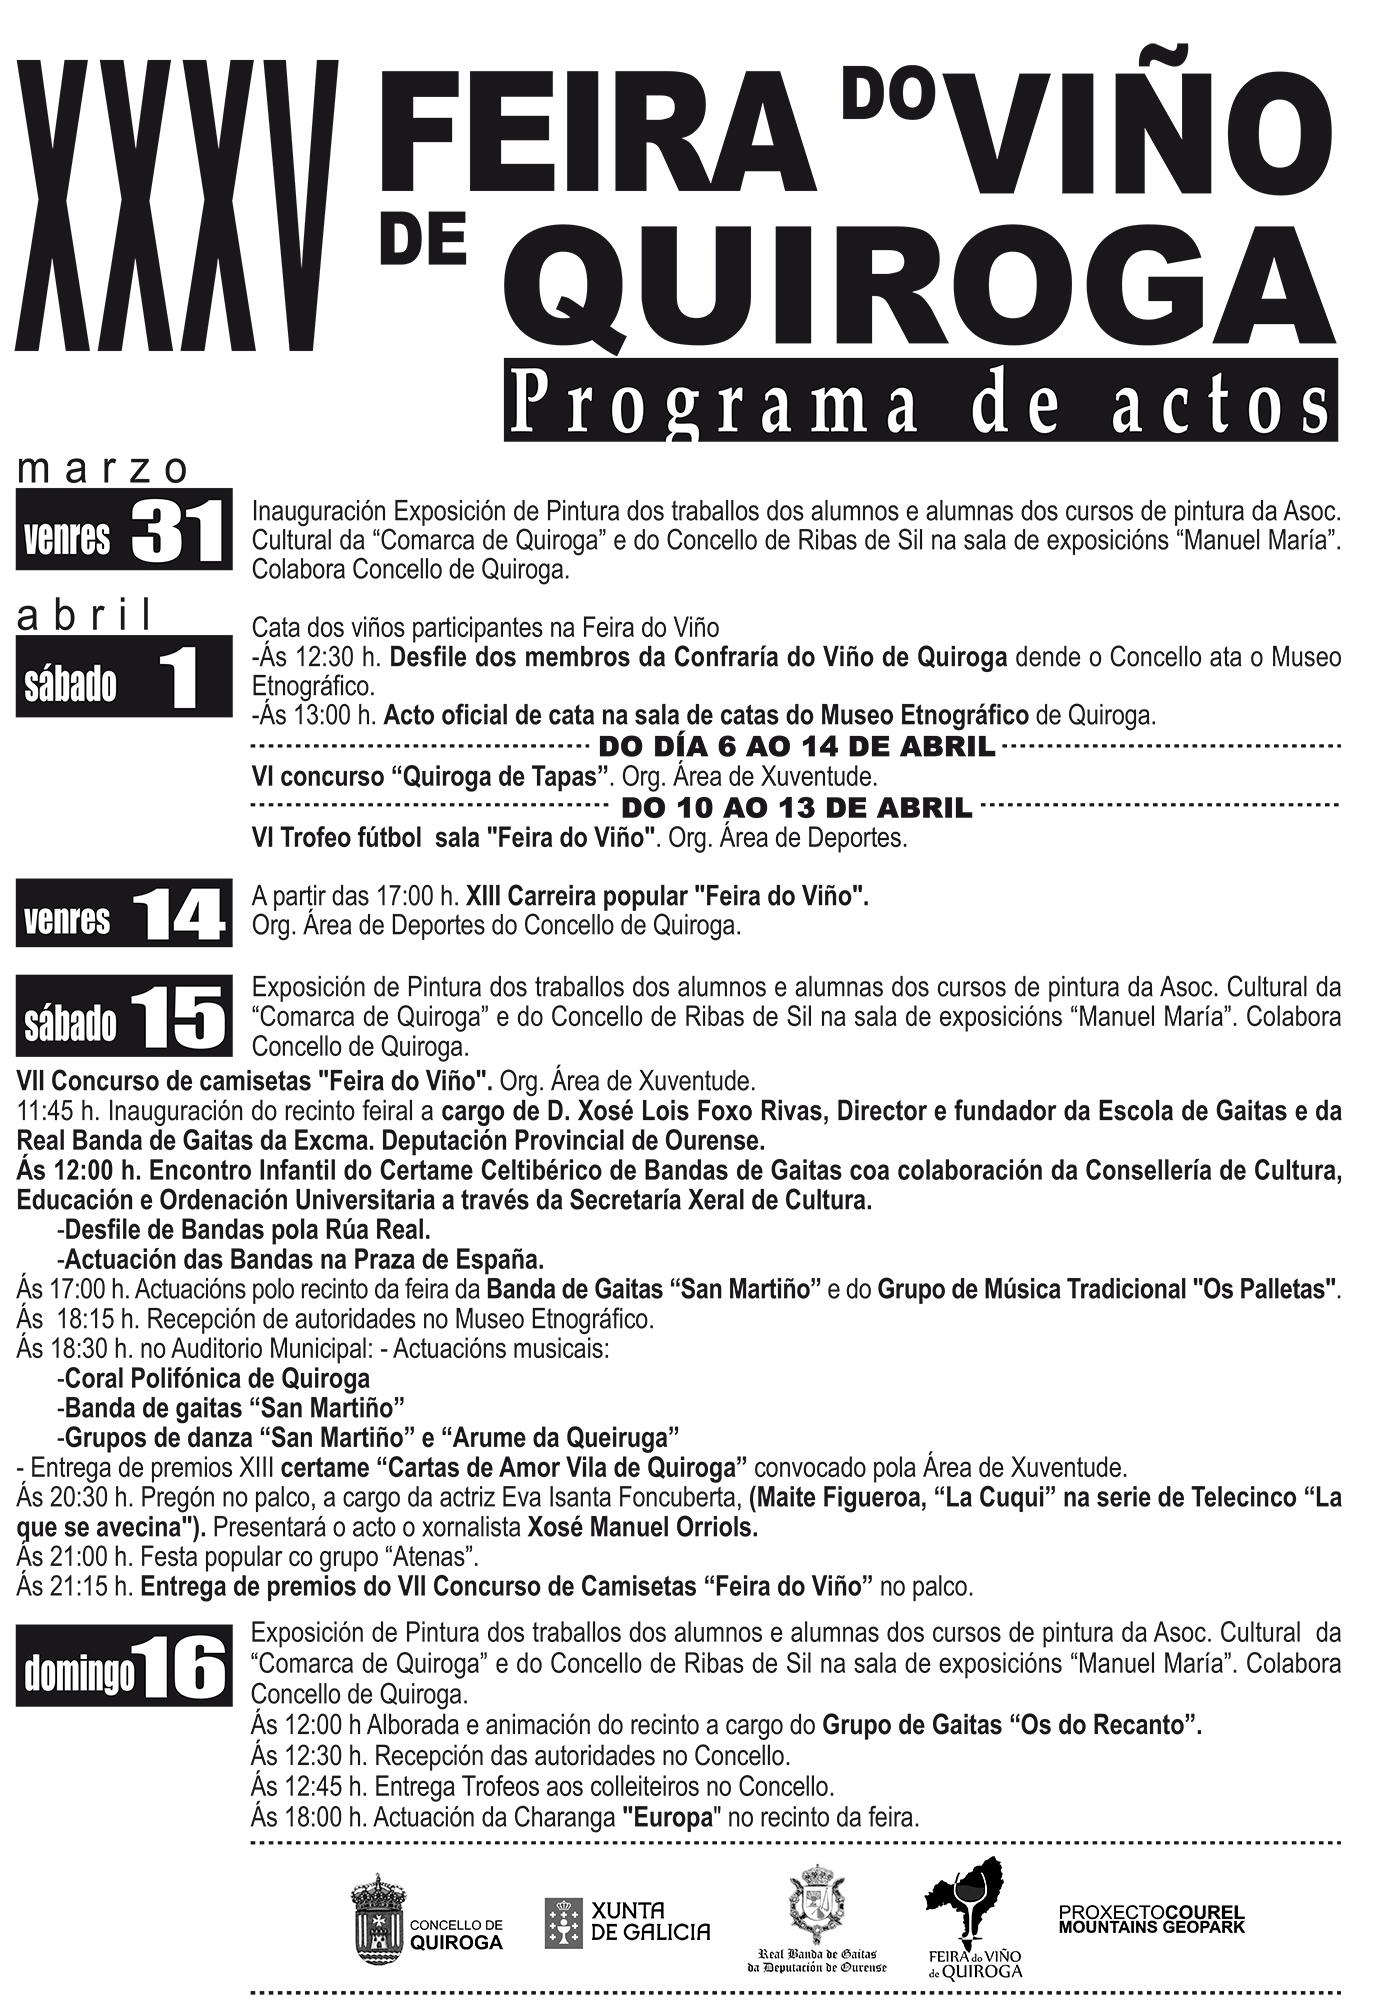 Programa de actos de la XXXV Feria del Vino de Quiroga